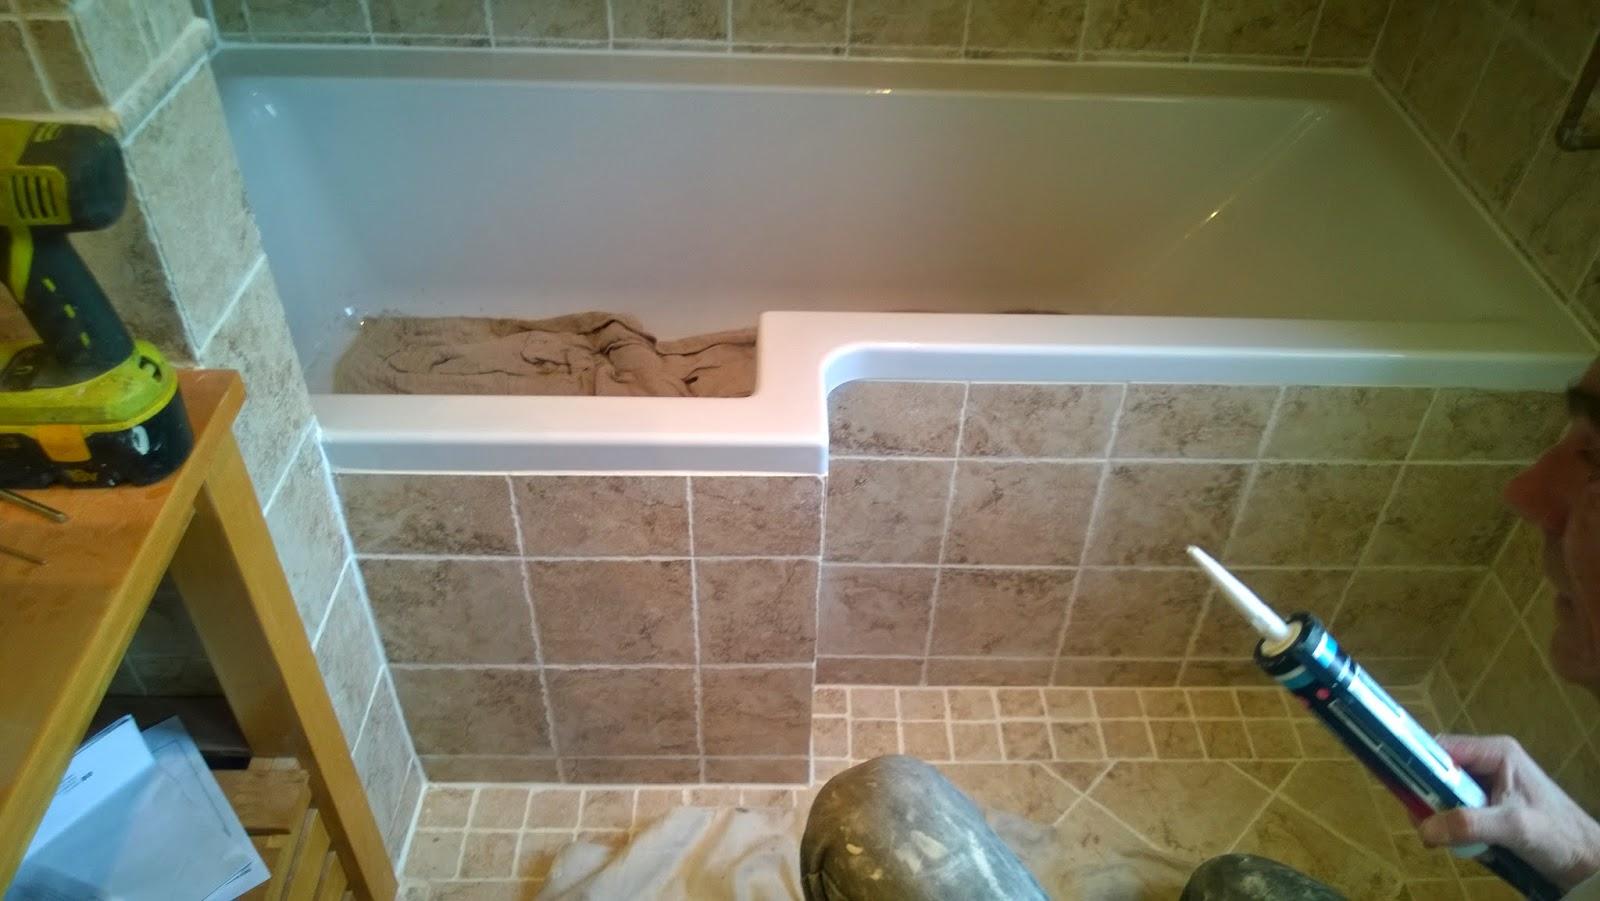 S1 builders ltd and hard lanscapers norfolk feedback for Bathroom builders liverpool